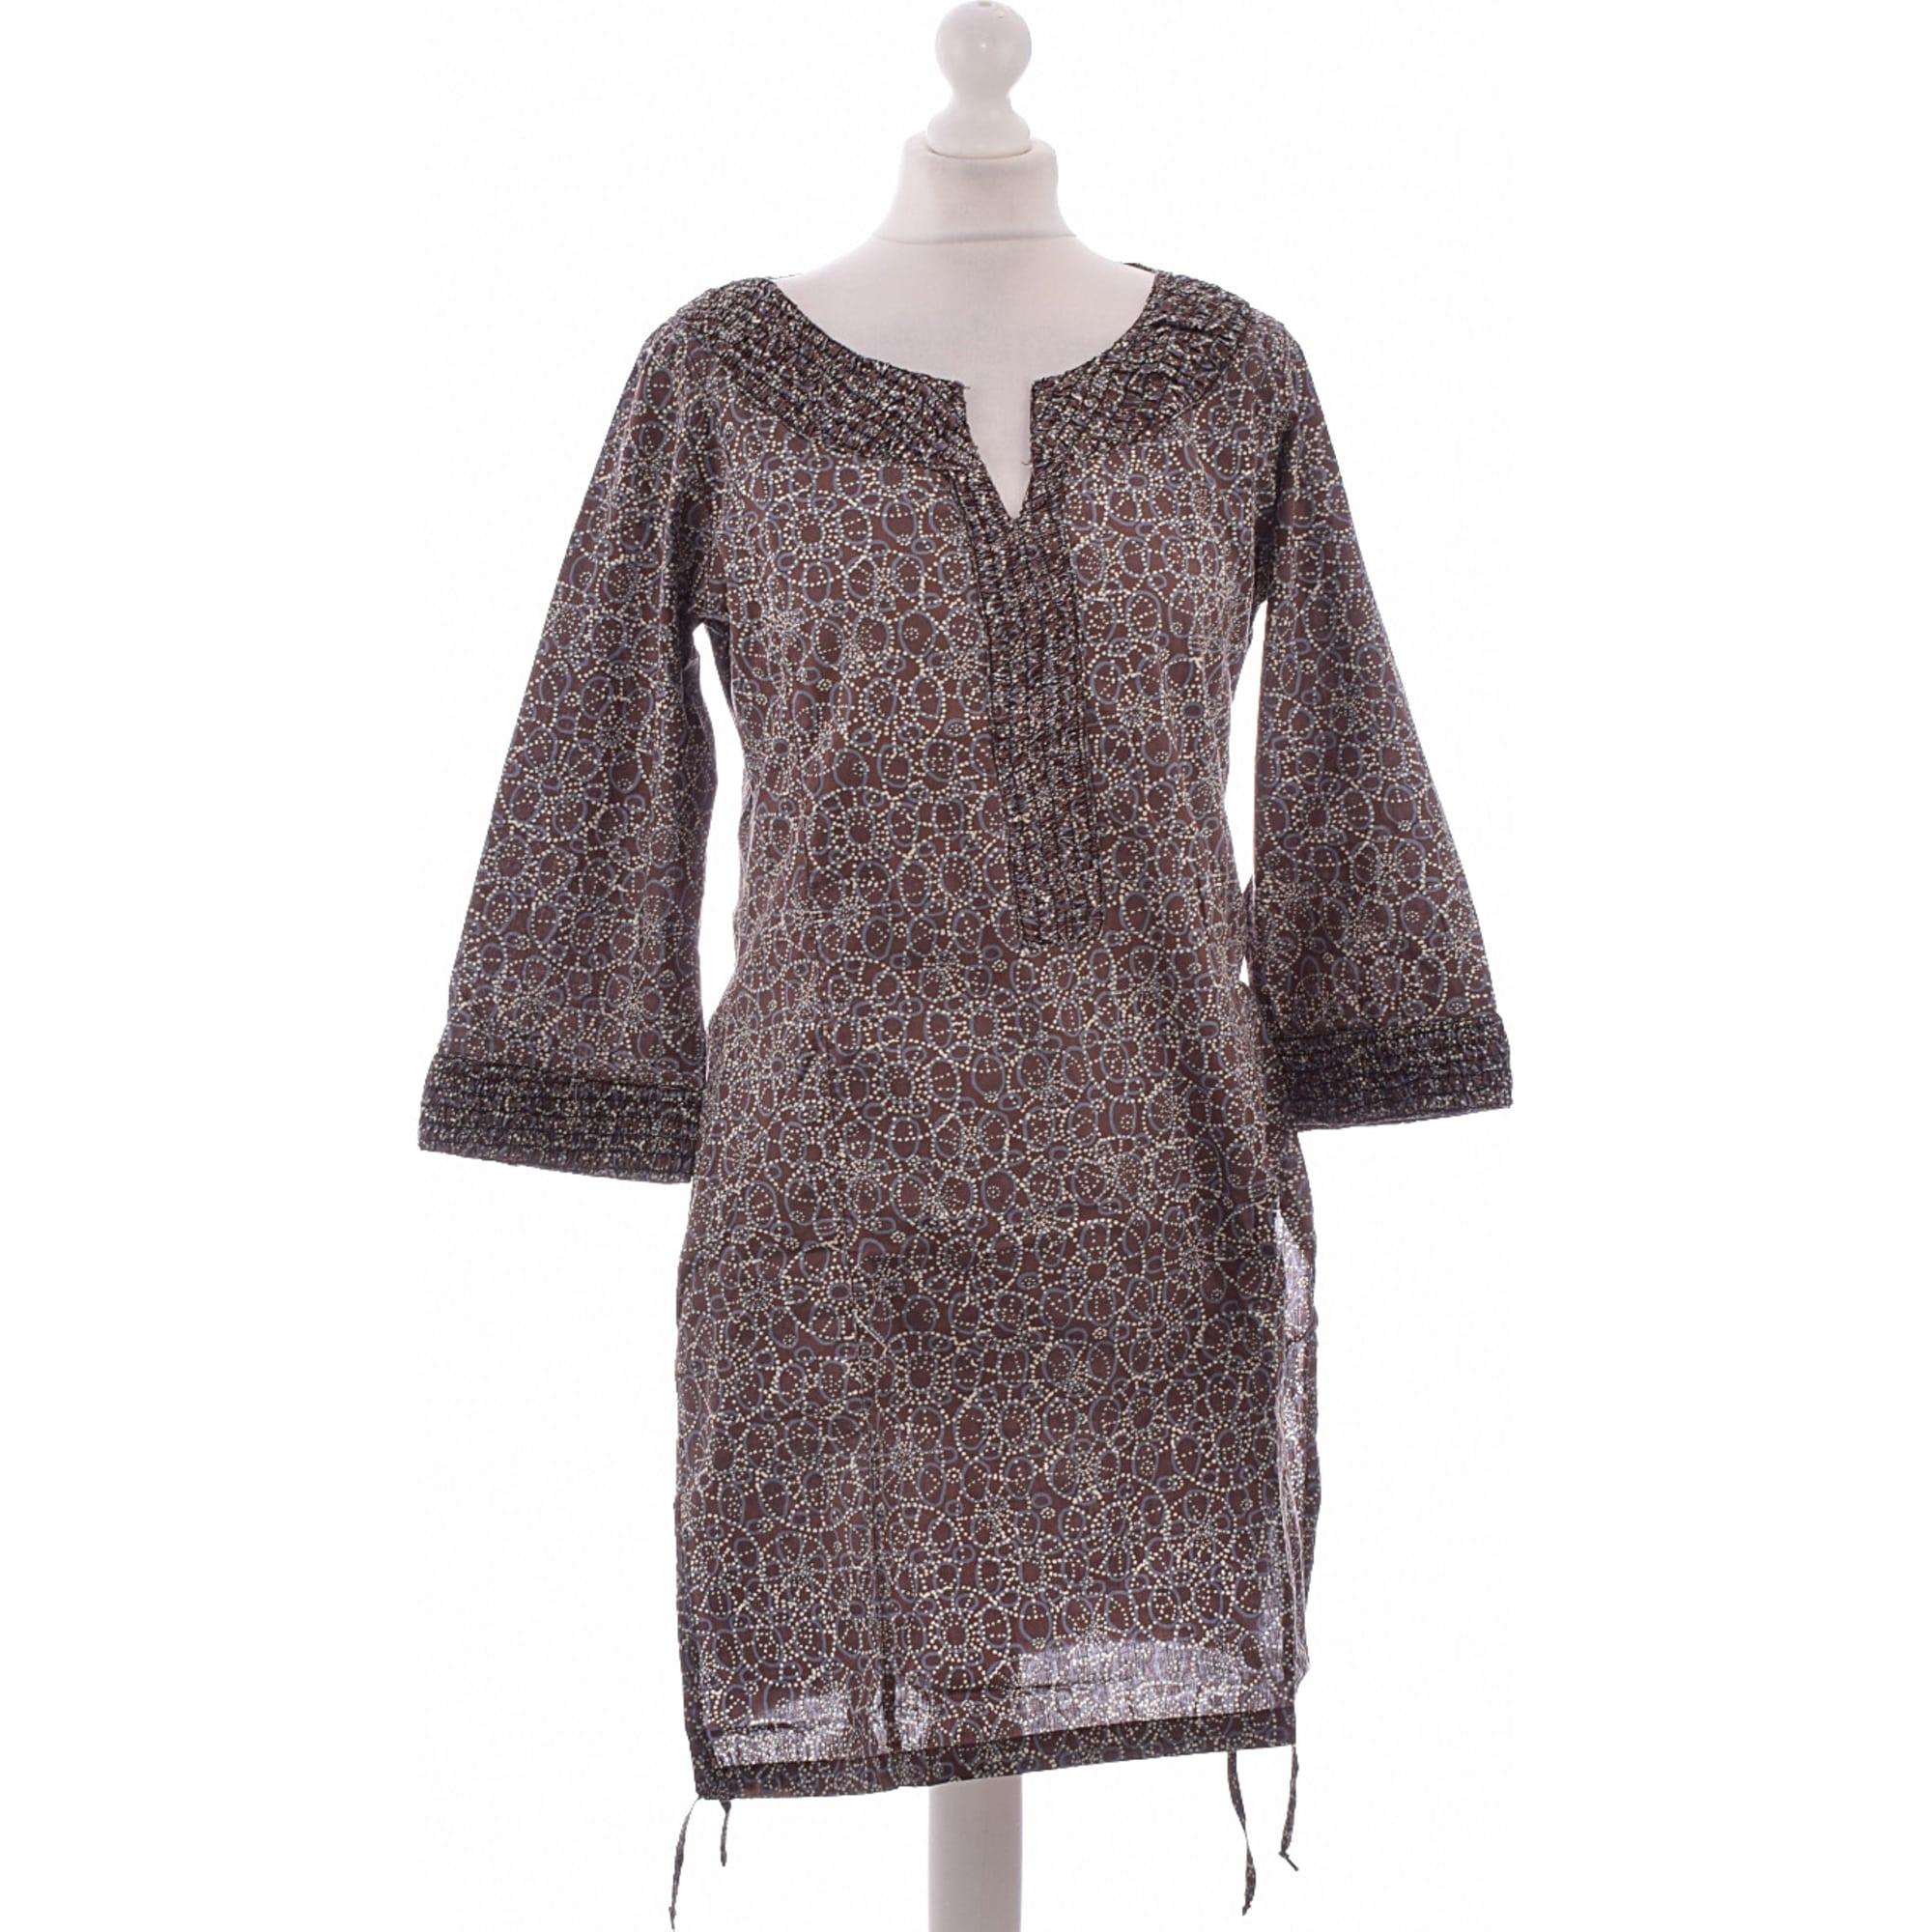 55f89f585a9 Robe courte MISS CAPTAIN Marron